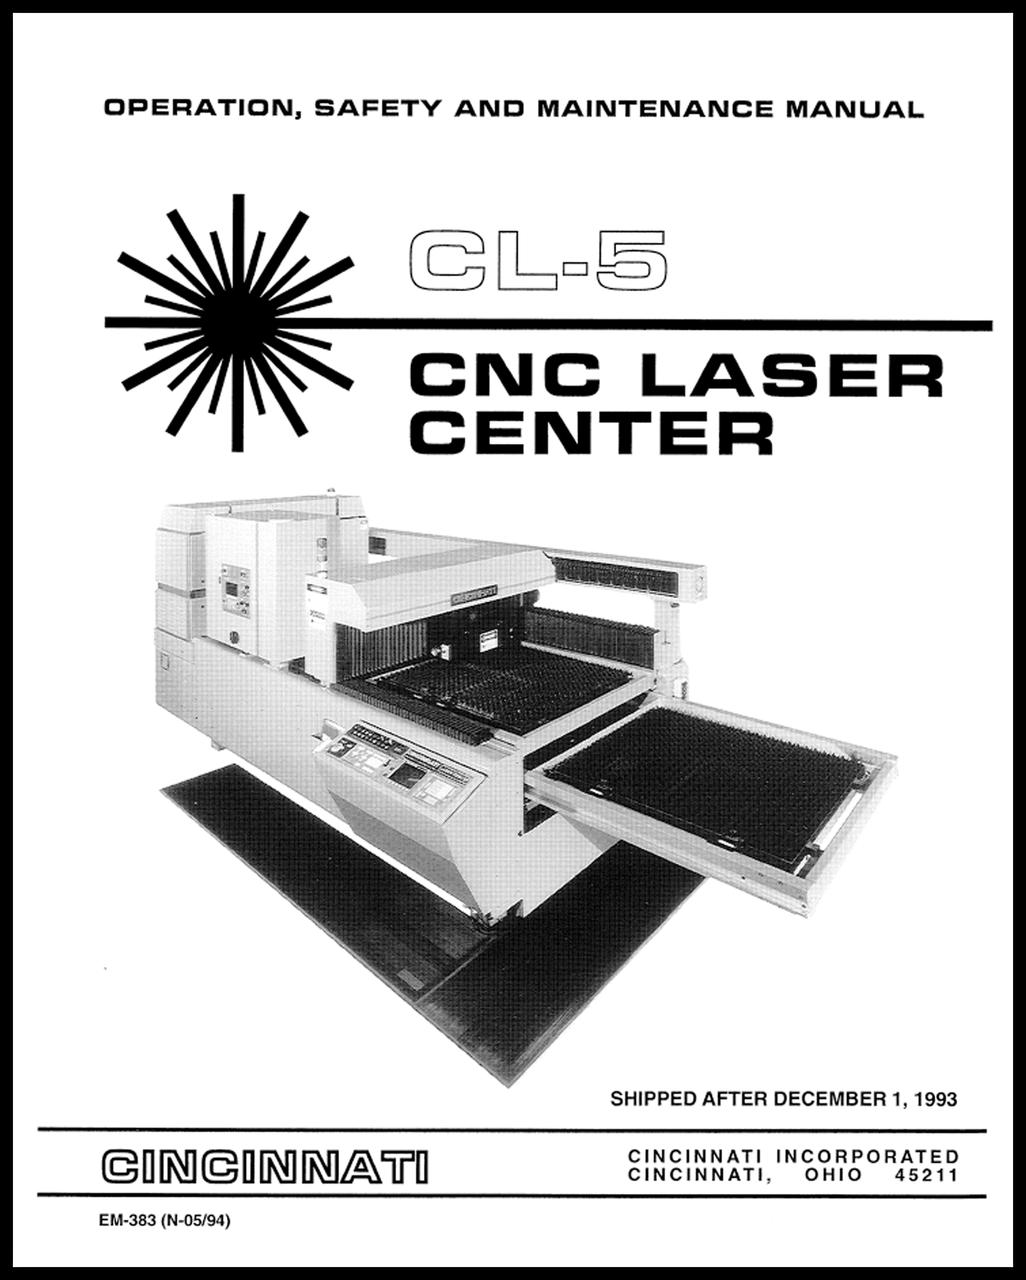 EM-383 (N-05-94) CL-5 CNC Laser Center Operation, Safety and Maintenance Manual Shipped After December 1, 1993